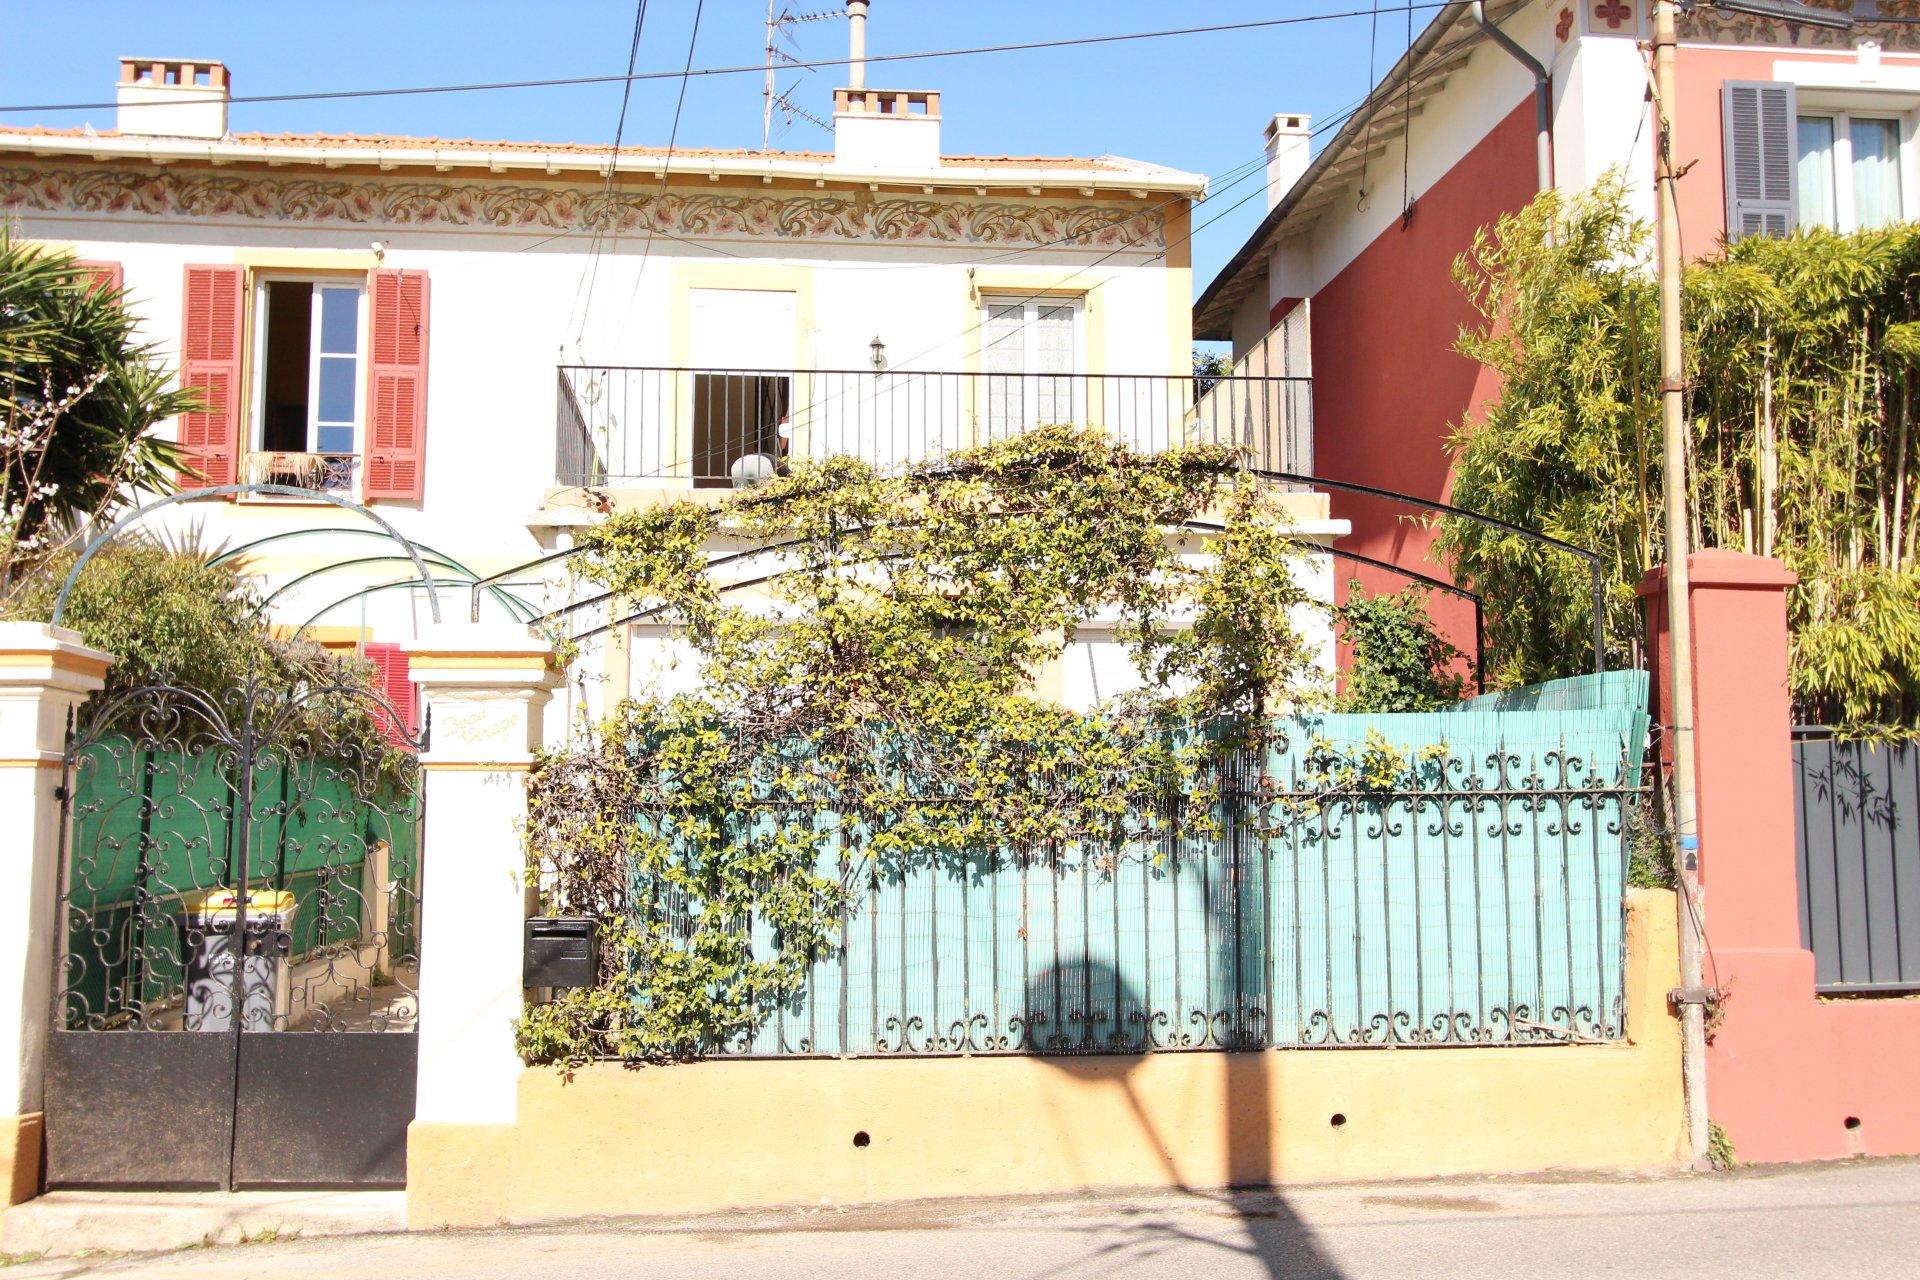 3/4 pièces Pessicart Terrasse / jardin